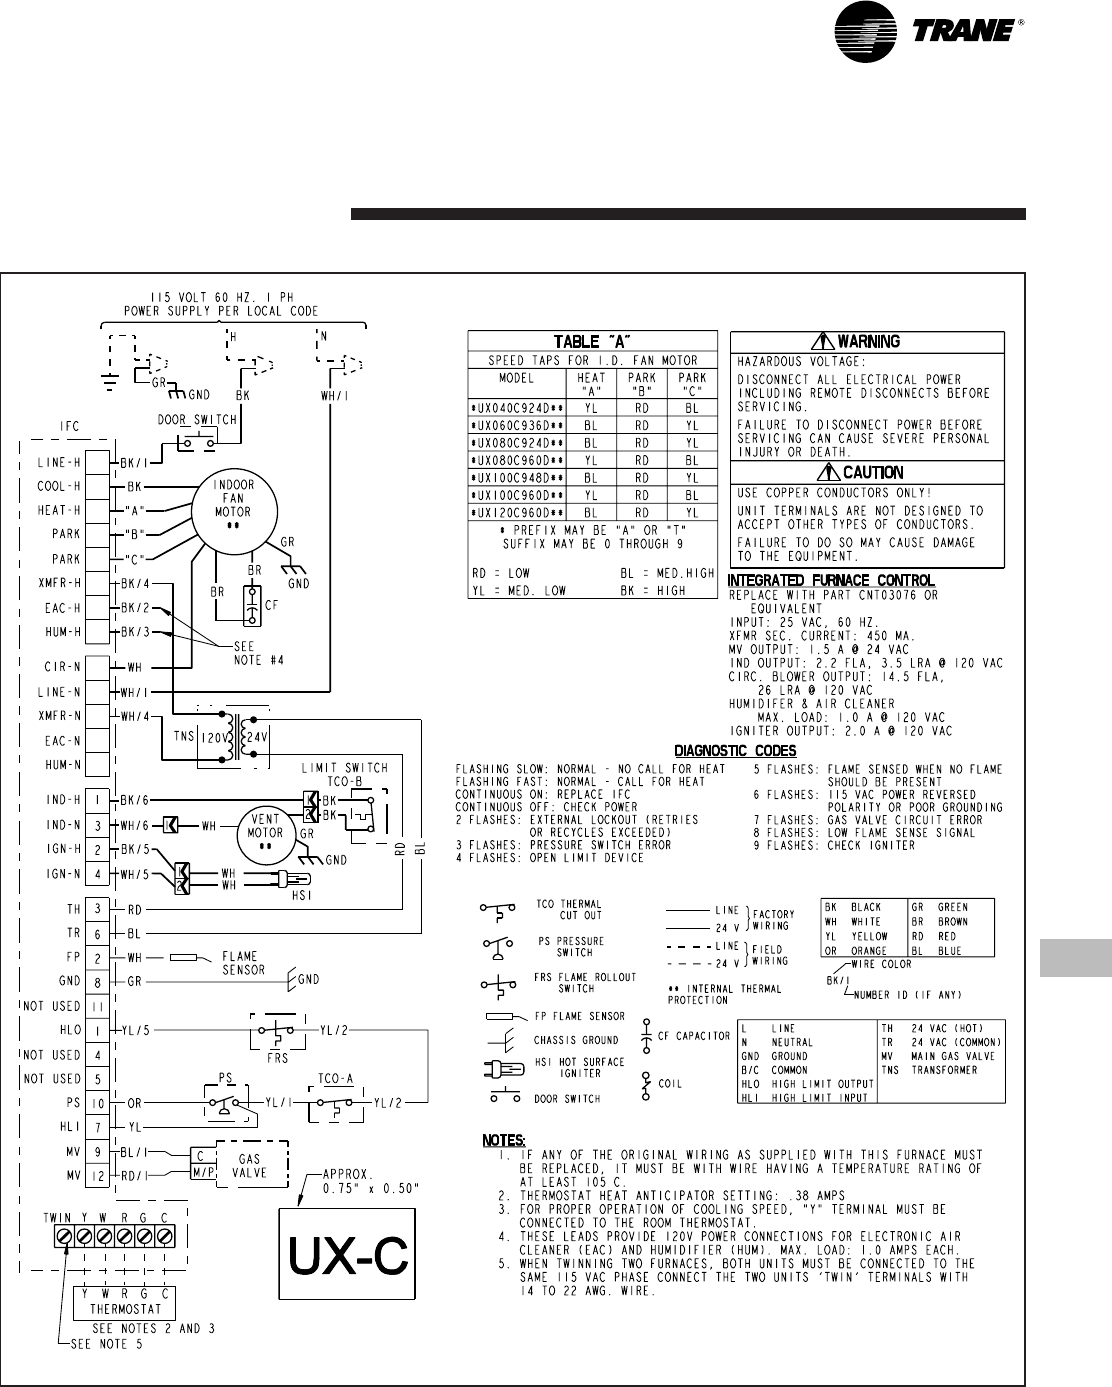 Trane Xr 90 Series Owners Manual Manualslib Makes It Easy